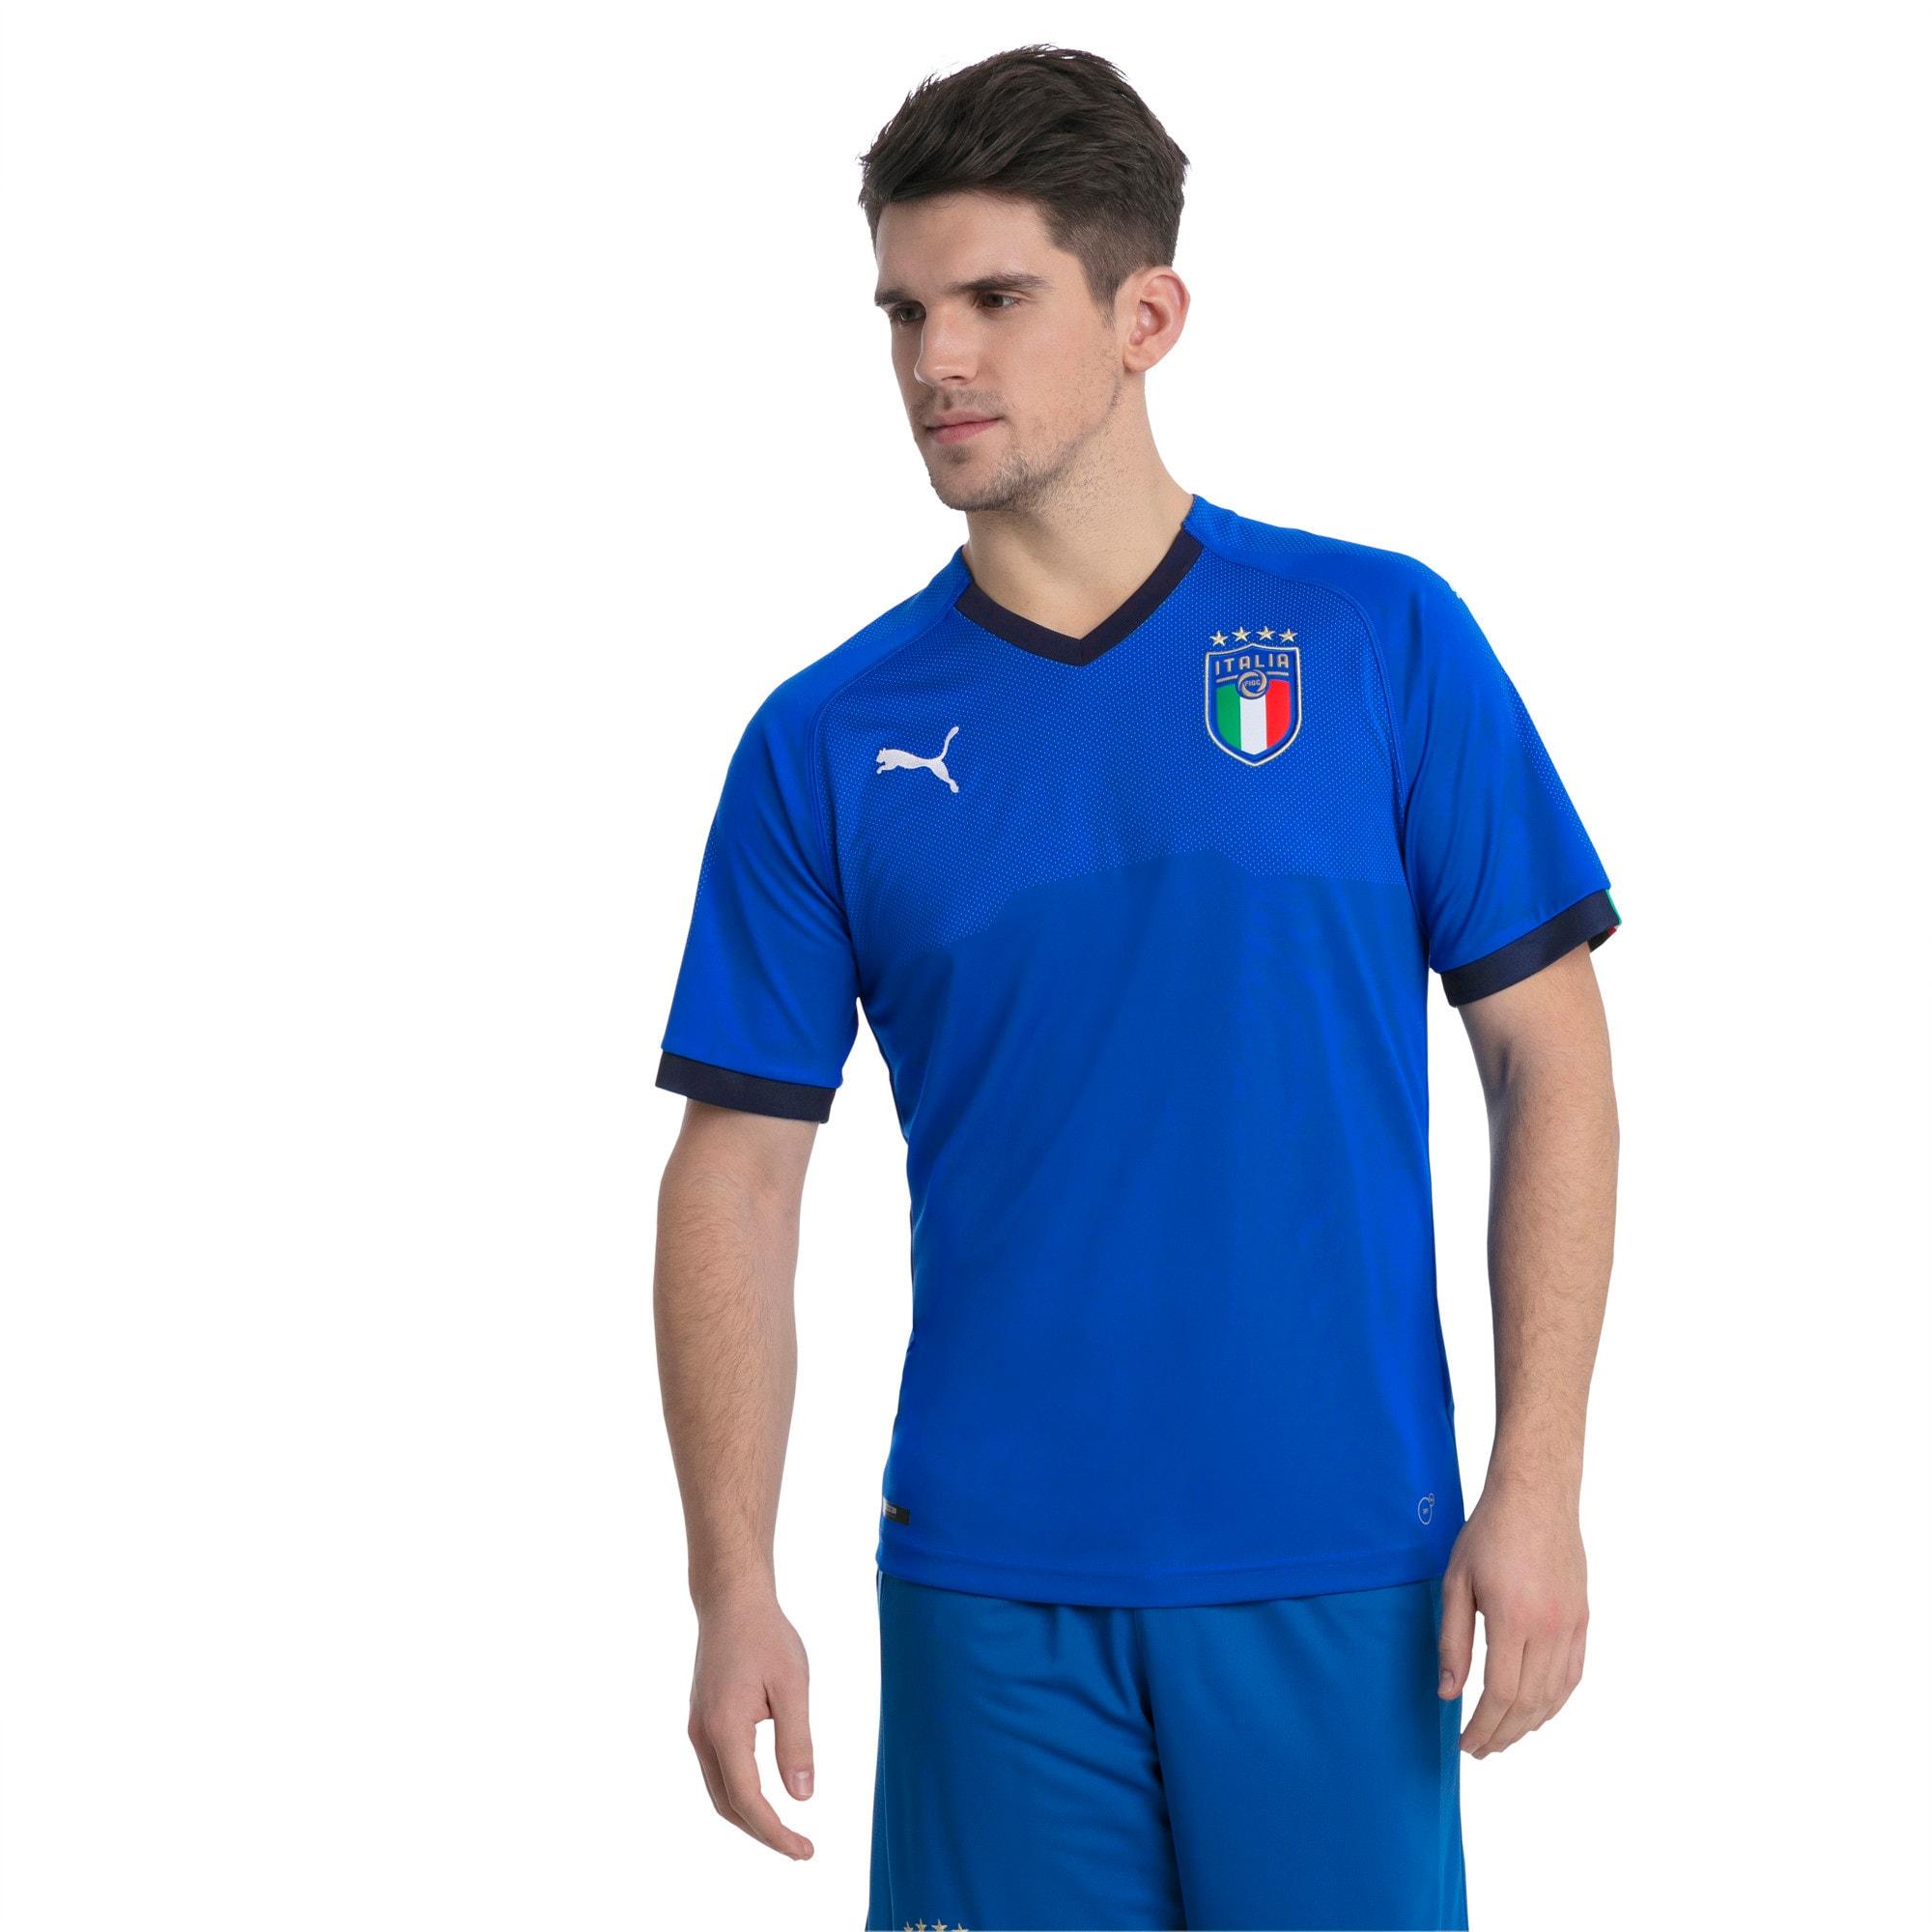 Thumbnail 1 of Italia Home Replica Jersey, Team Power Blue-Peacoat, medium